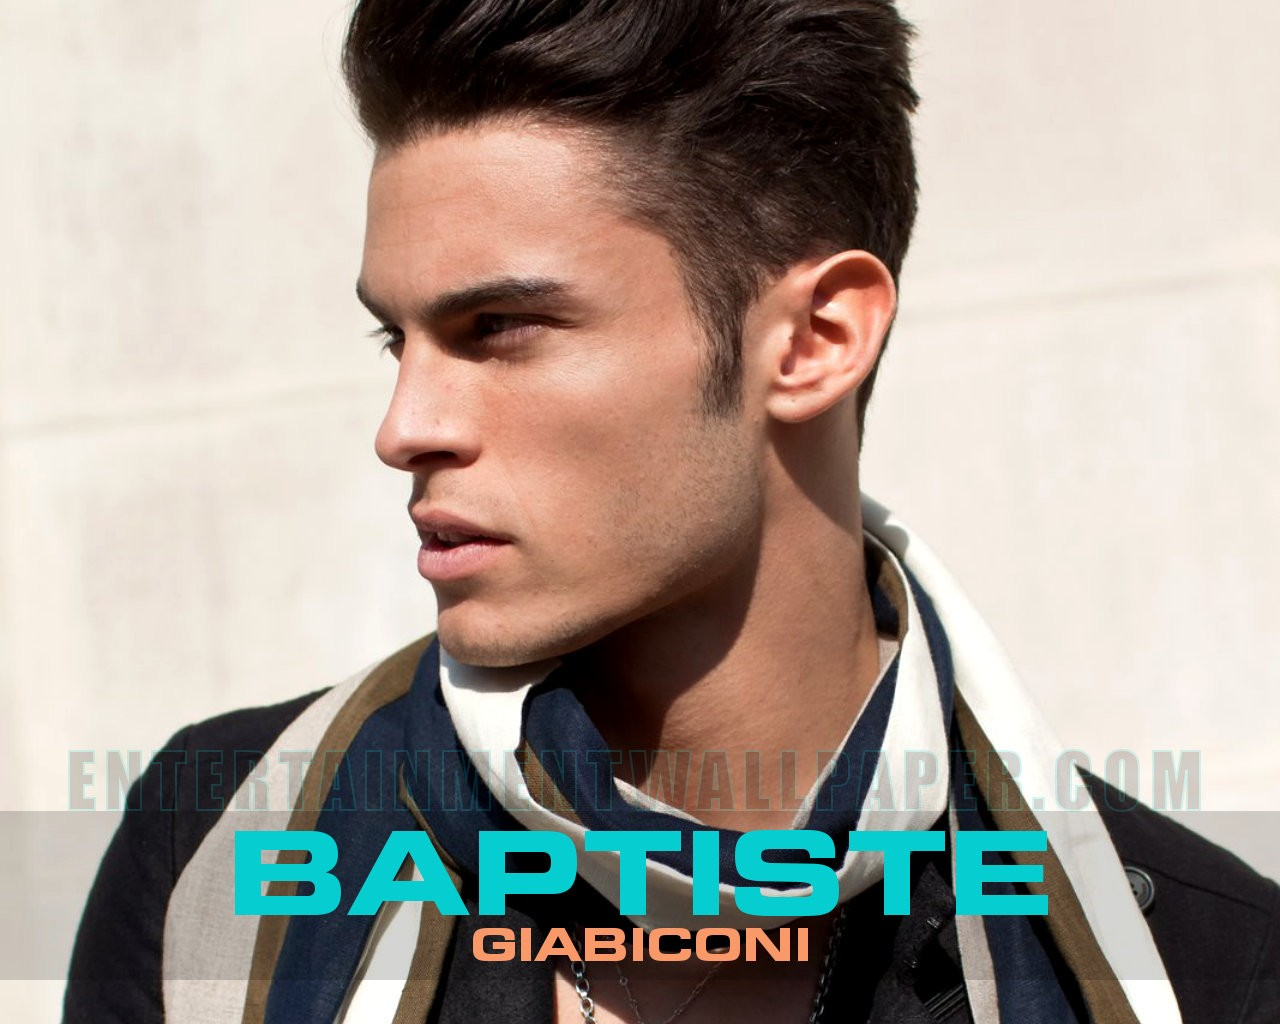 baptiste-giabiconi07